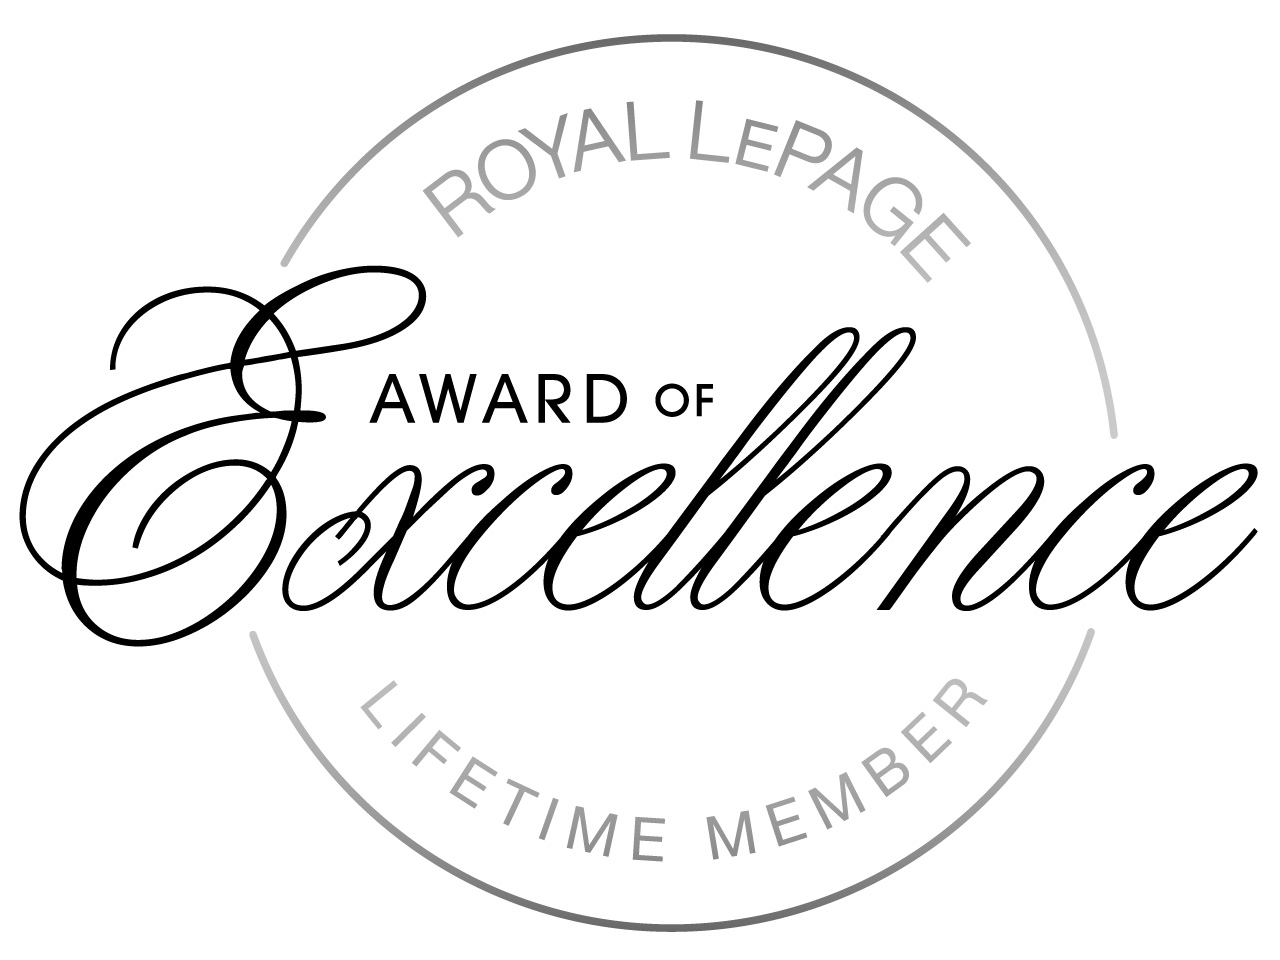 Royal LePage Sales Achievement Award, Tony Fabiano